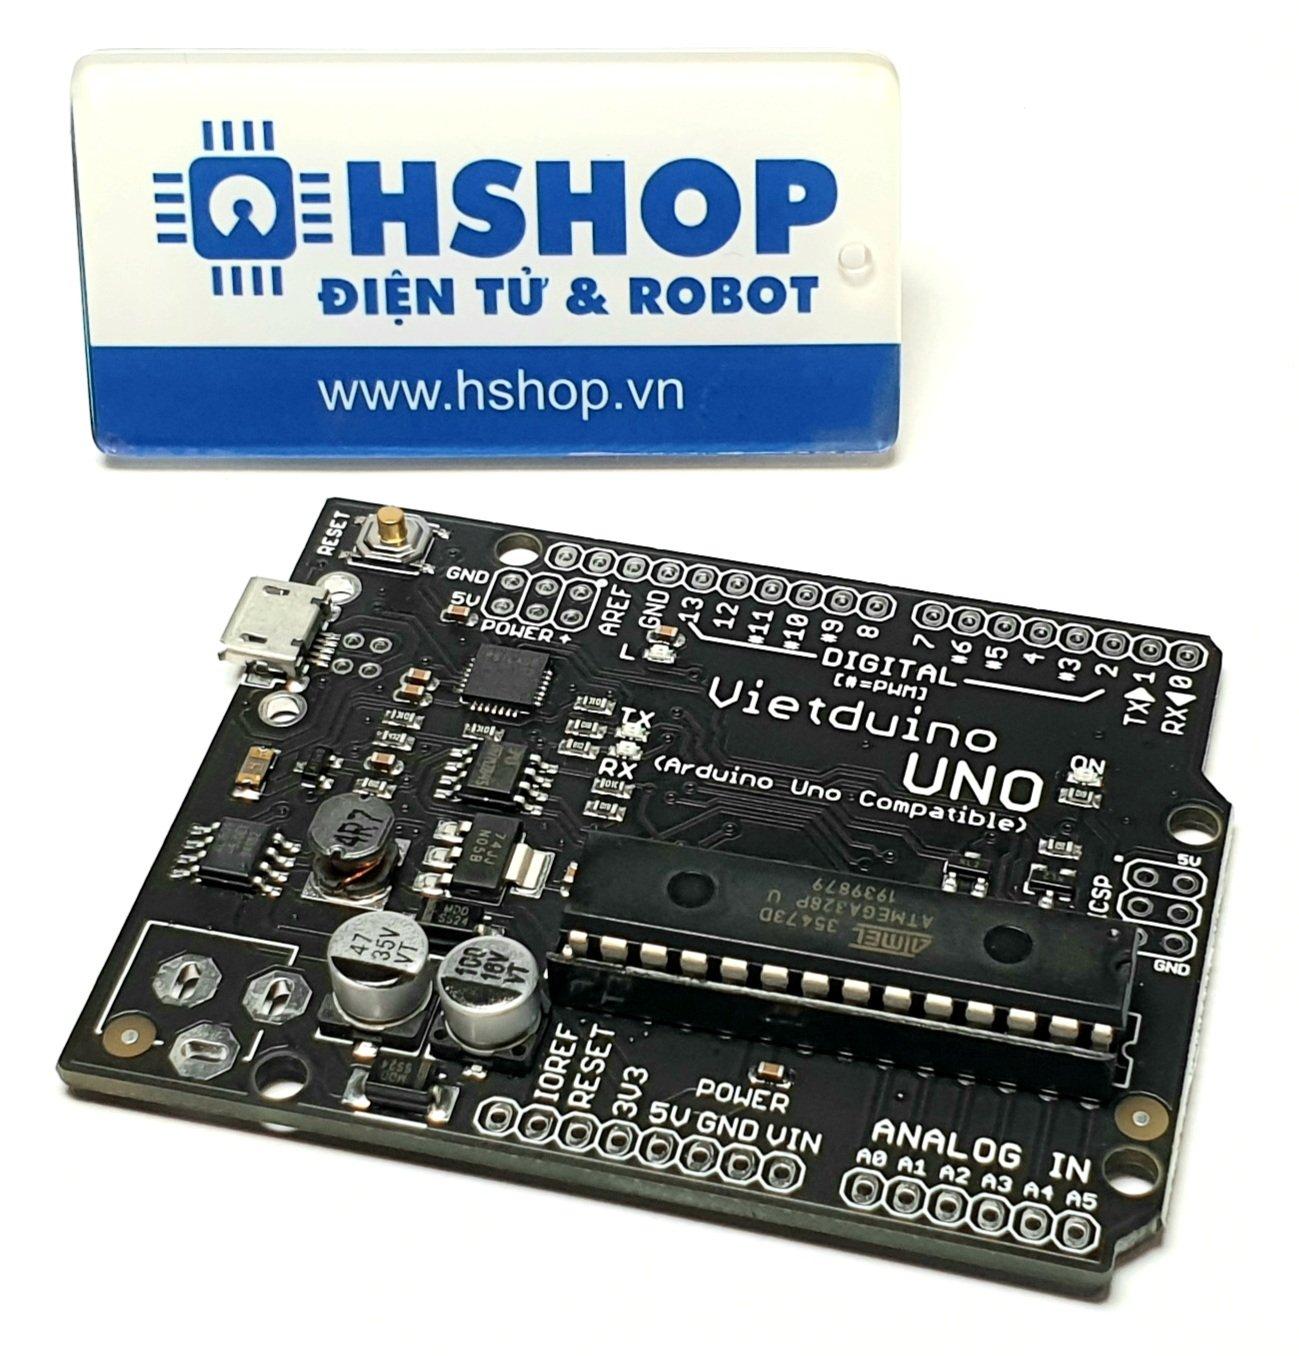 Vietduino Uno (Arduino Uno Compatible)